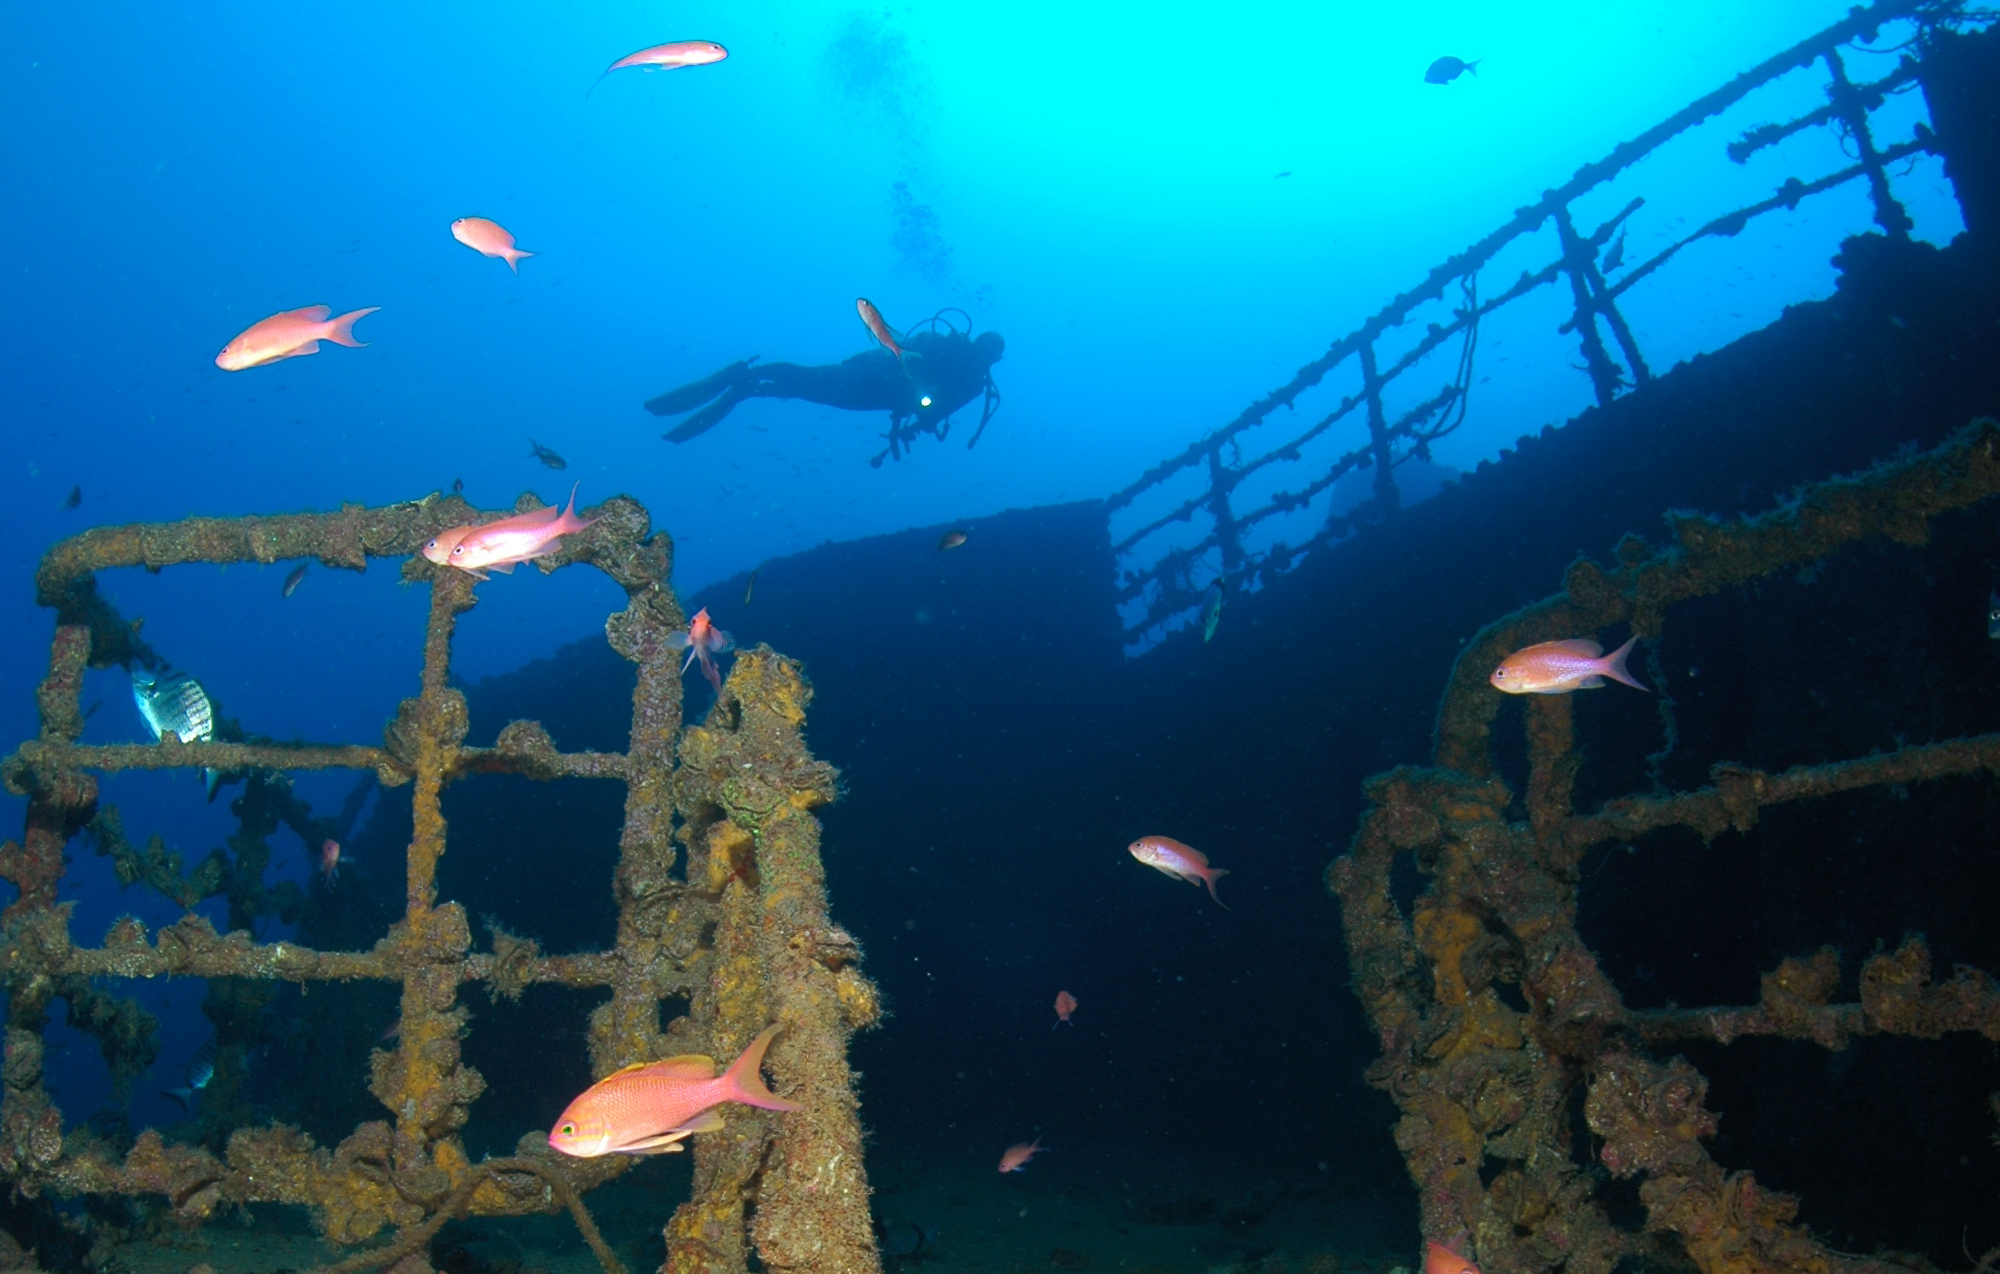 tauchkurs-advanced-open-water-diver-in-nordhausen-fuer-fortgeschrittene-bg3